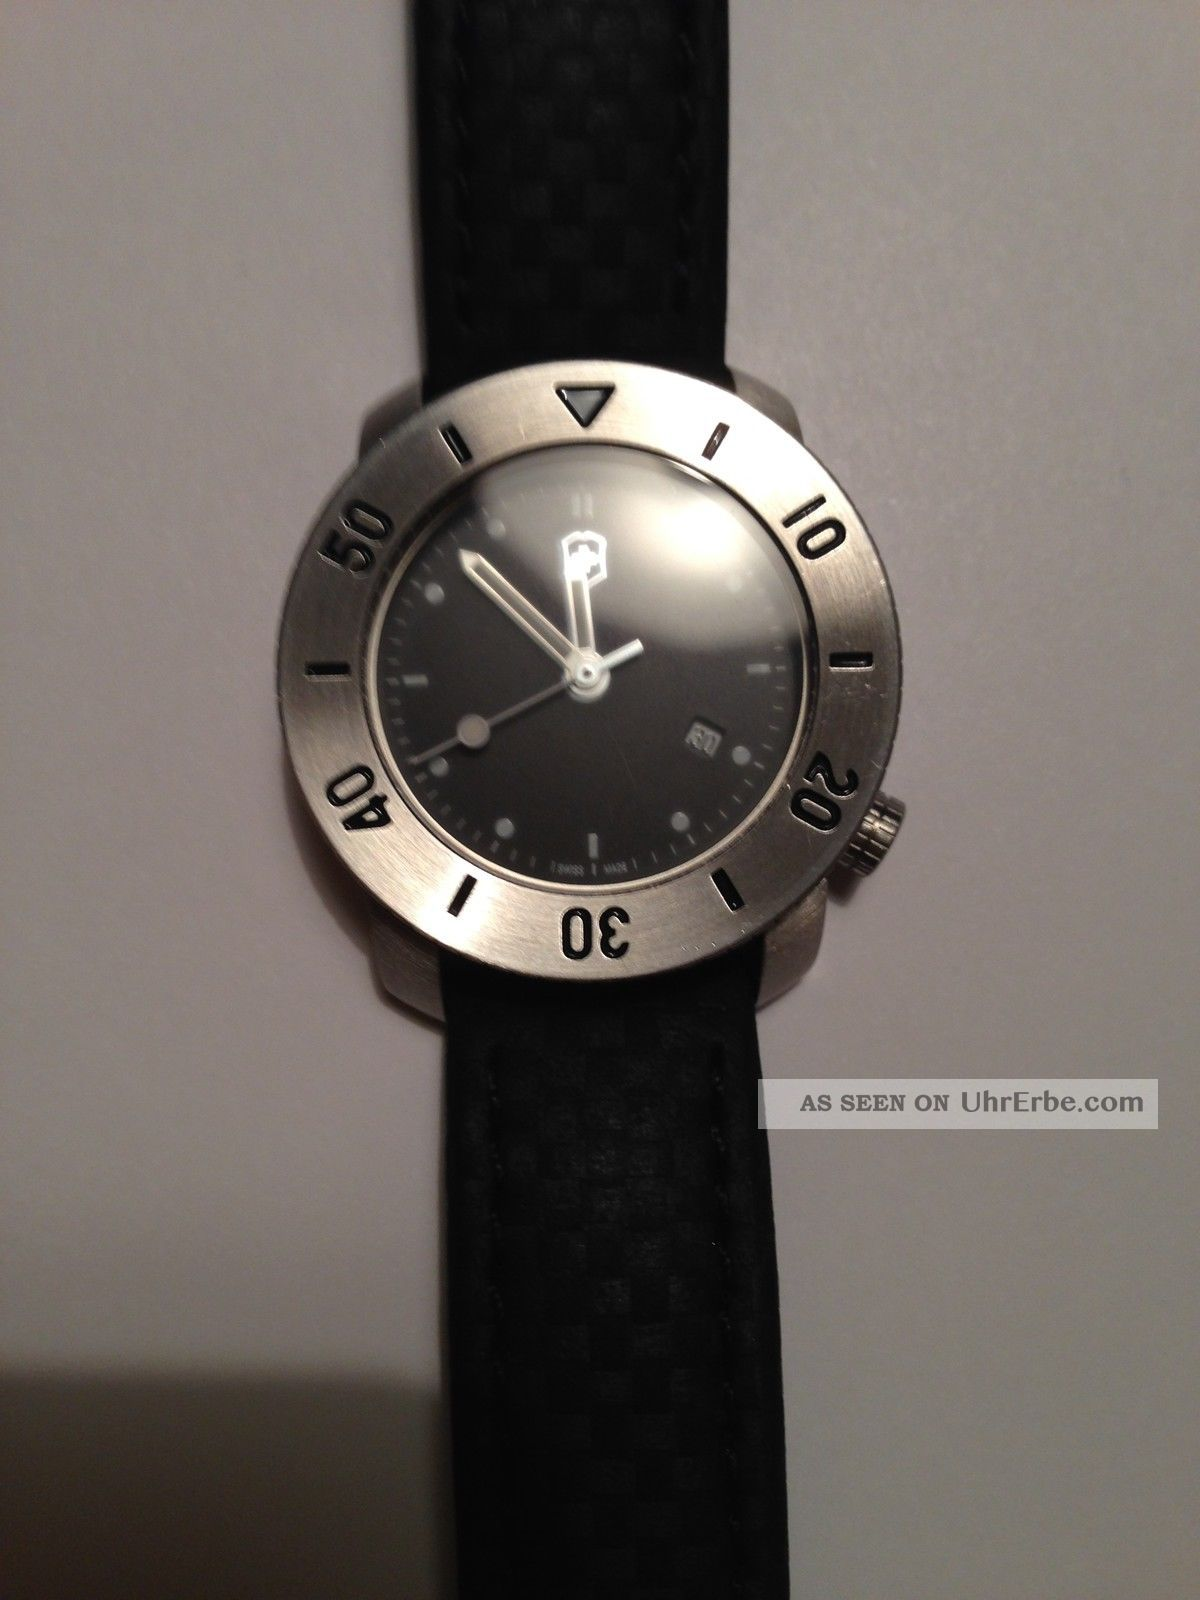 Victorinox Armbanduhr Edelstahl Analog Water - Resistant (10 Bar) Made In Swiss Armbanduhren Bild